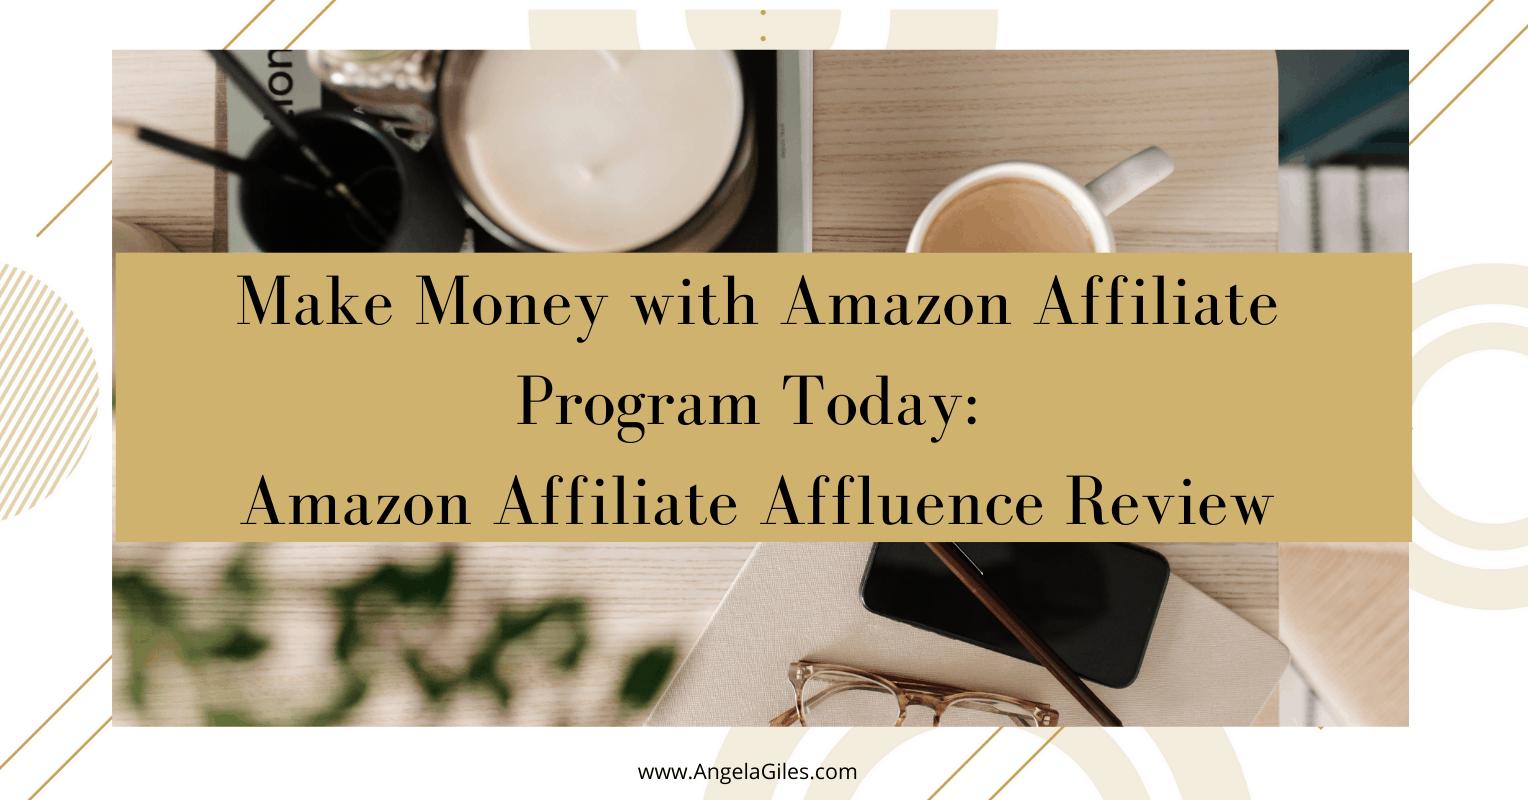 Make Money with Amazon Affiliate Program Today: Amazon Affiliate Affluence Review